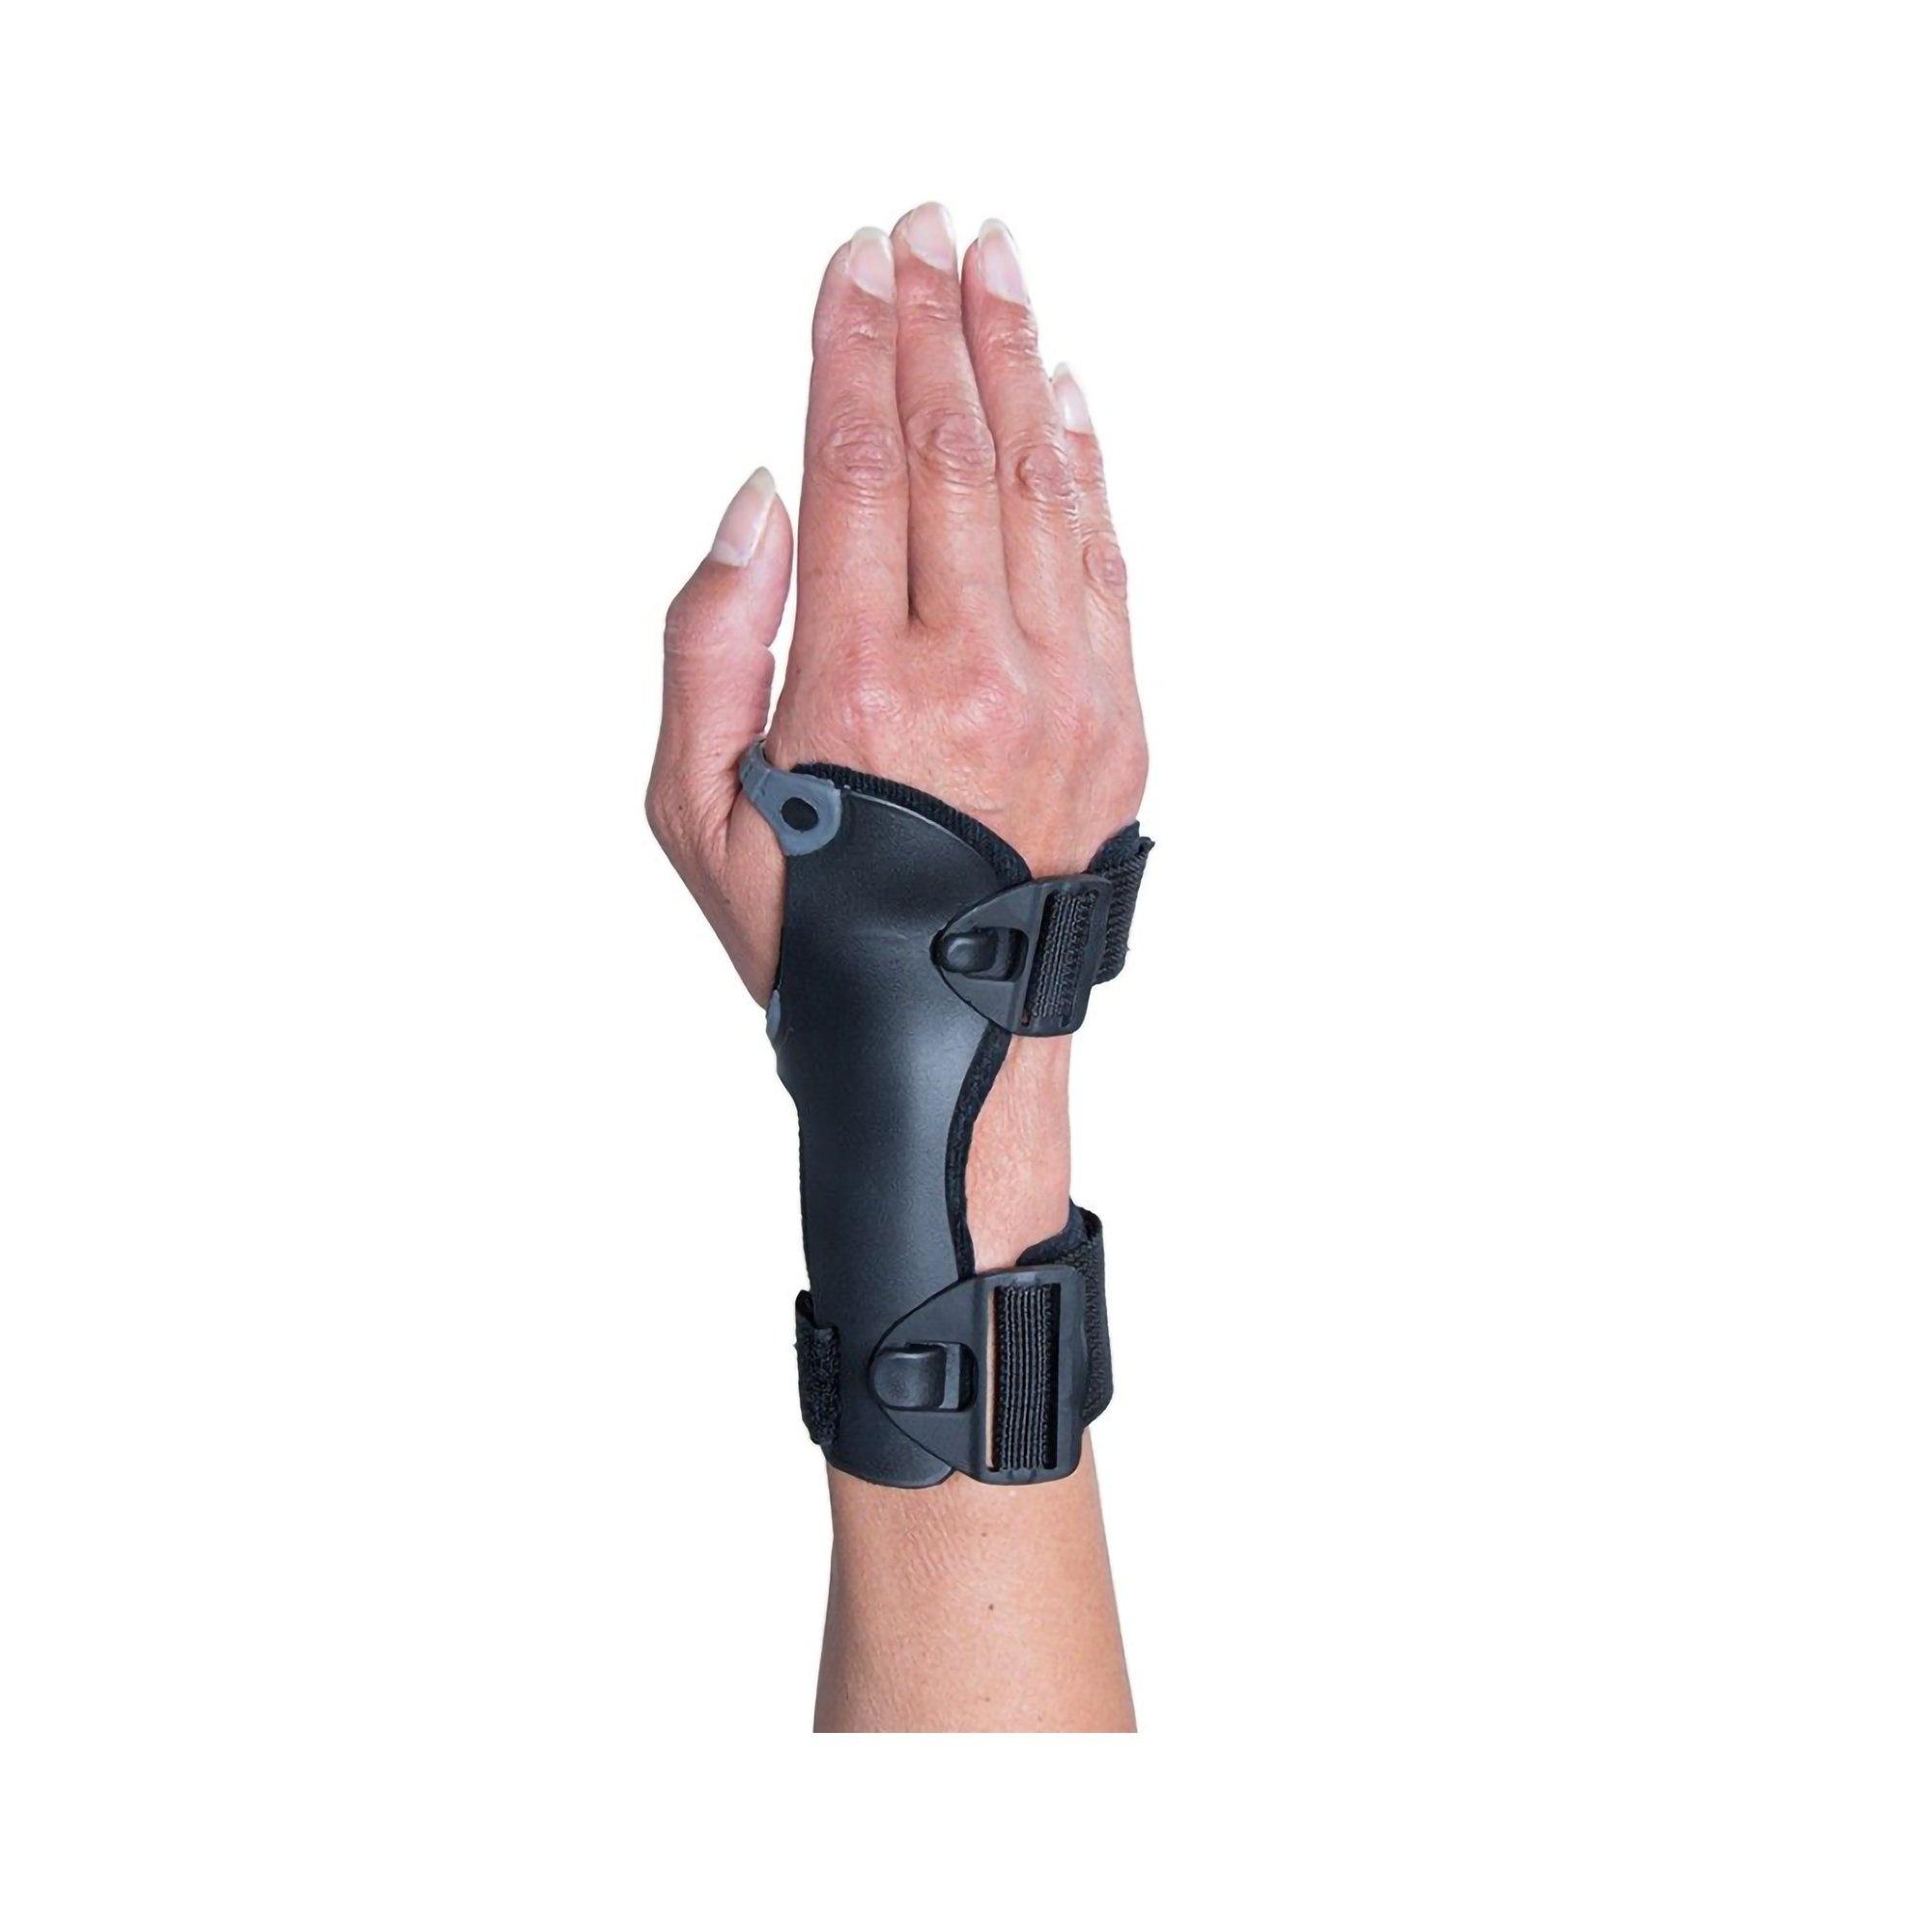 "Ossur Exoform Left Carpal Tunnel Wrist Support, 517085, Medium (Wrist 6.5-7.75""/Palm 8-9.25"") - 1 Each"